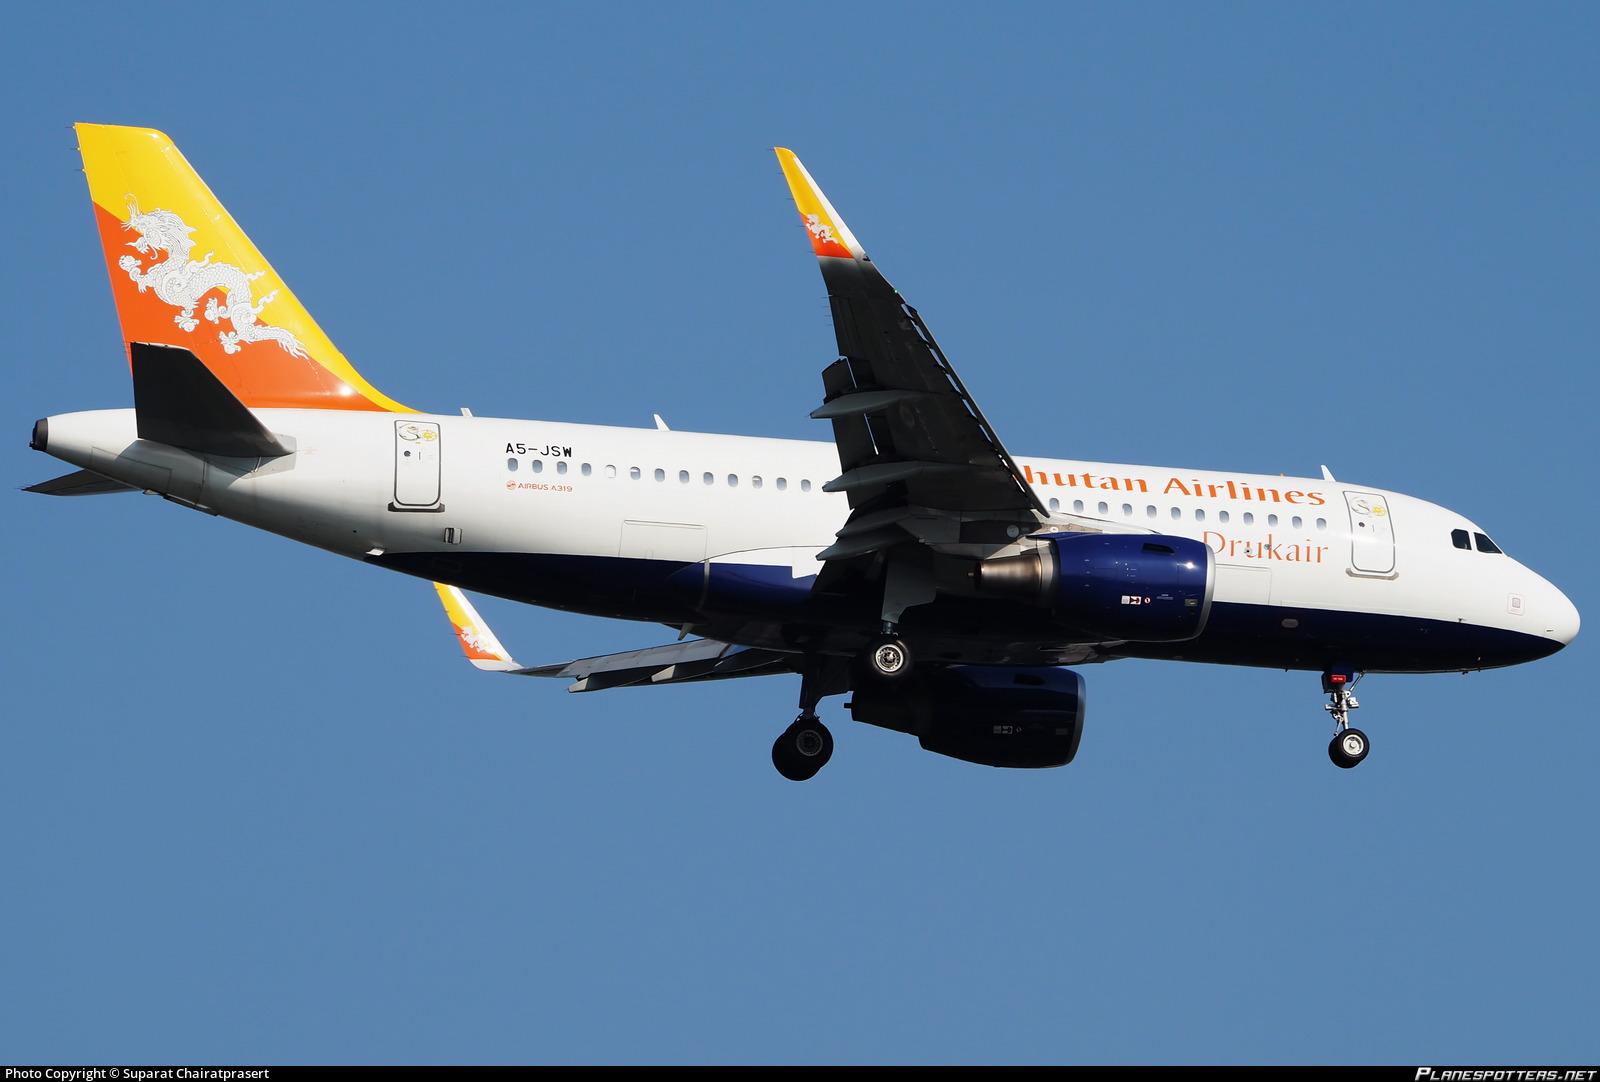 A5 Jsw Druk Air Royal Bhutan Airlines Airbus A319 115wl Photo By